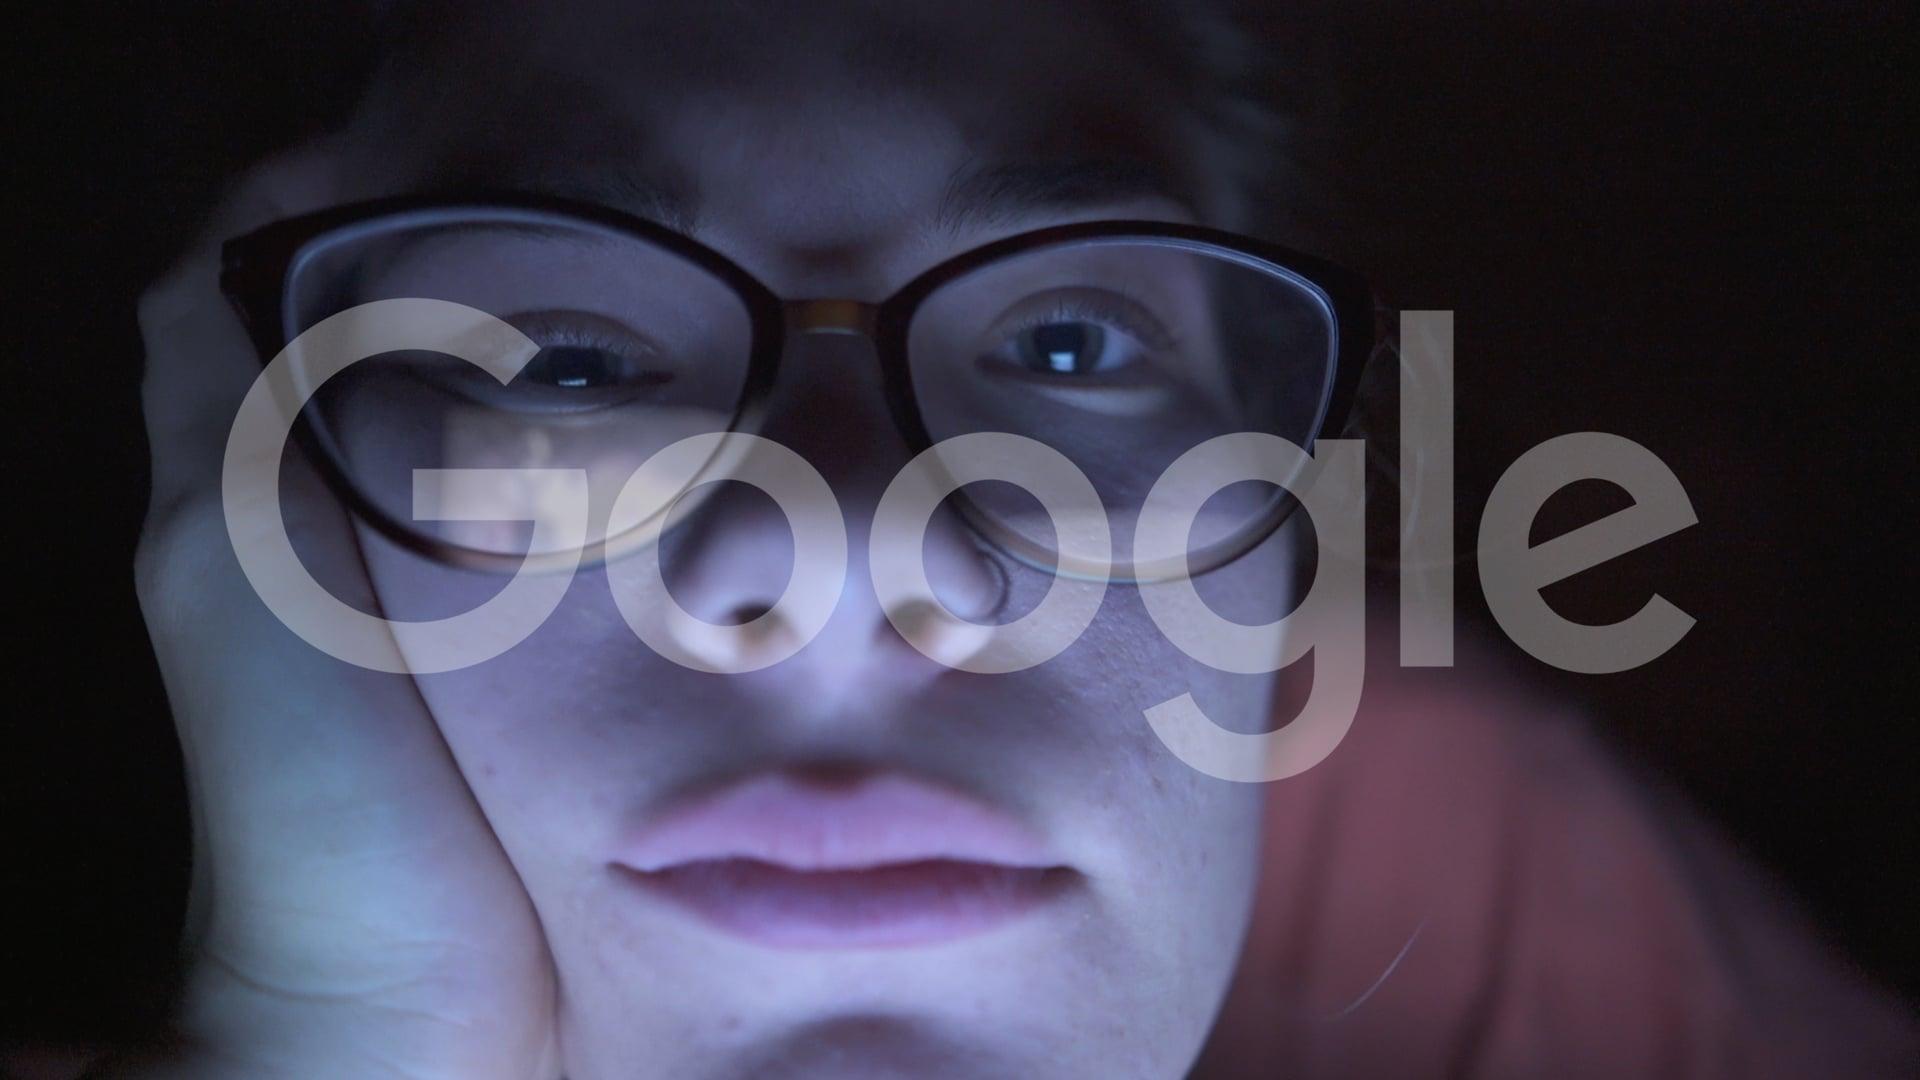 Google Anthem